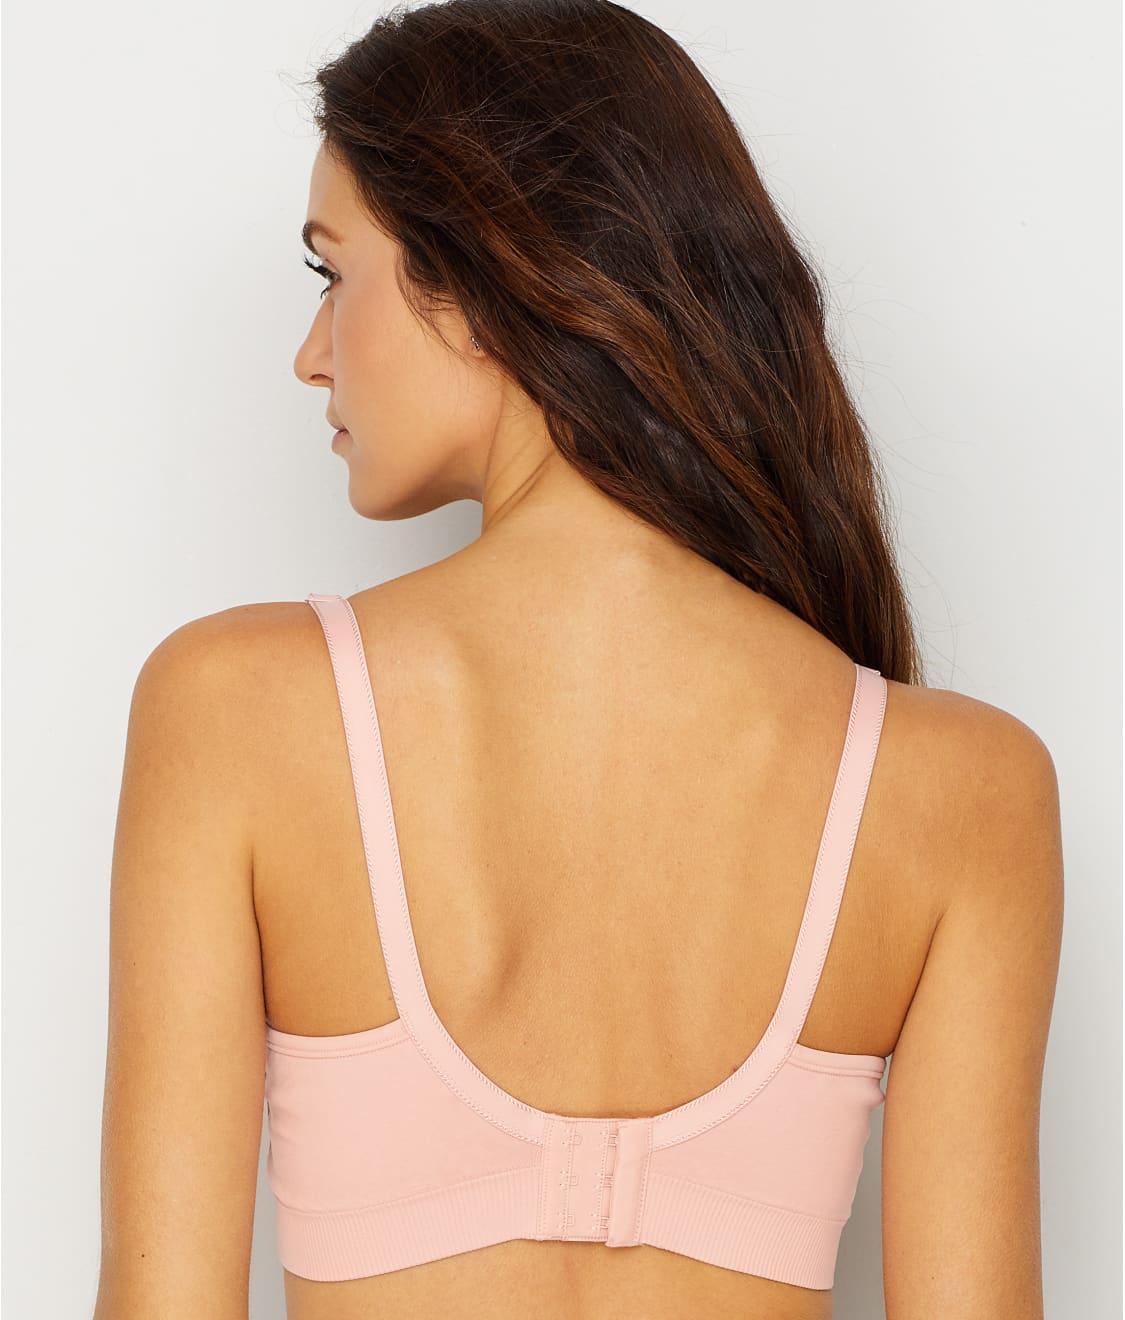 96e4a929d80b2 Bravado Designs Body Silk Wire-Free Nursing Bra | Bare Necessities ...